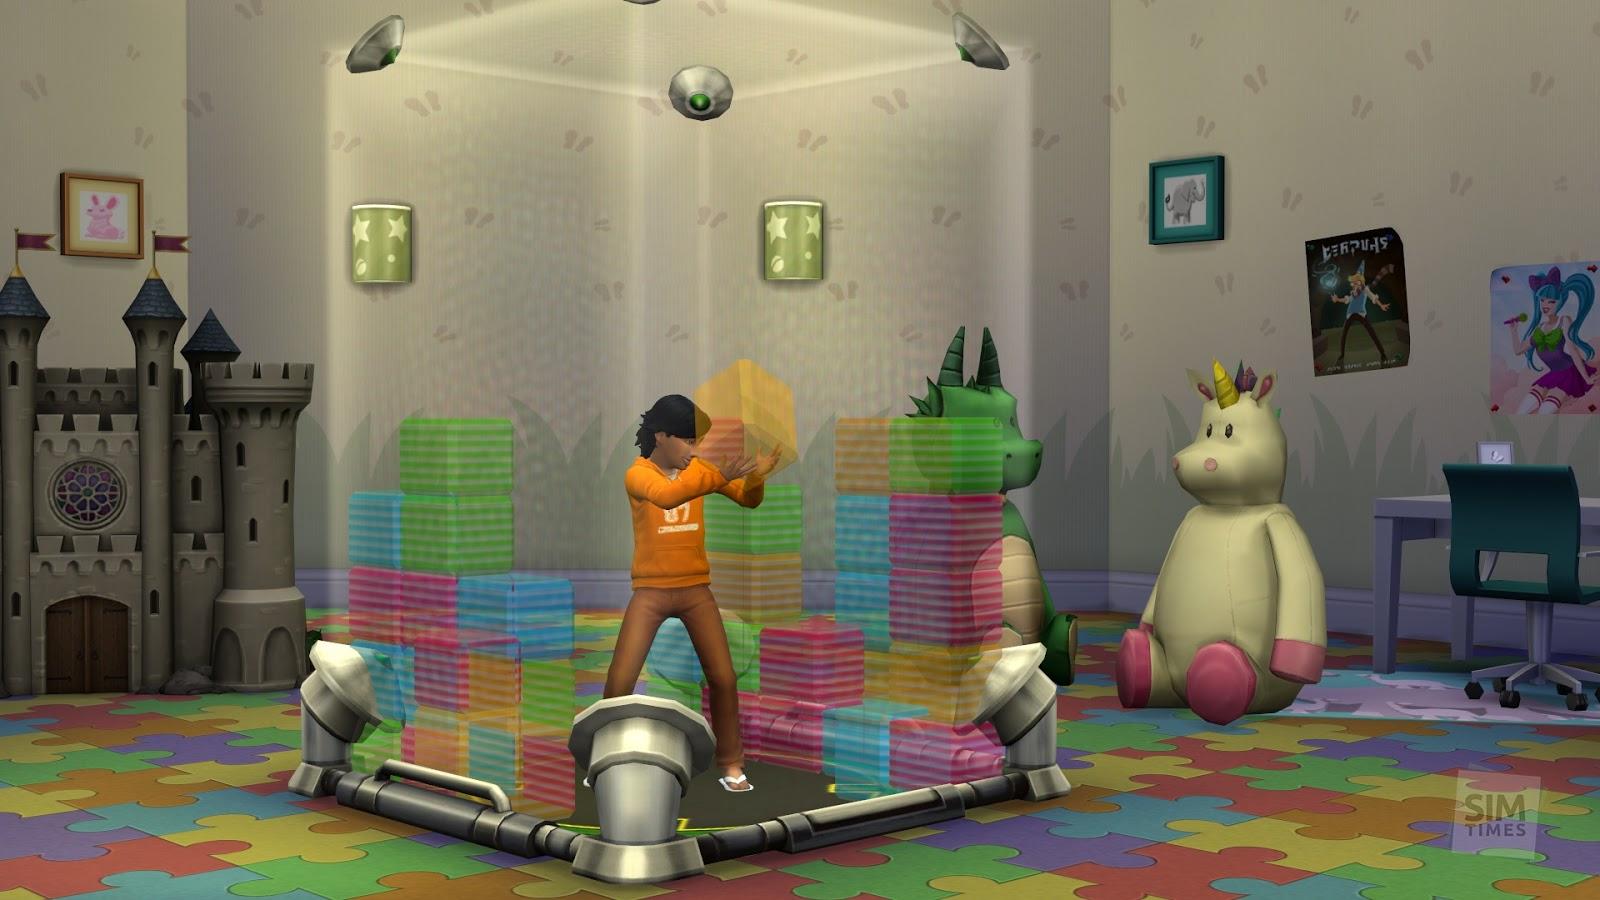 Imágenes sims 4 Sims4-screenshot-210